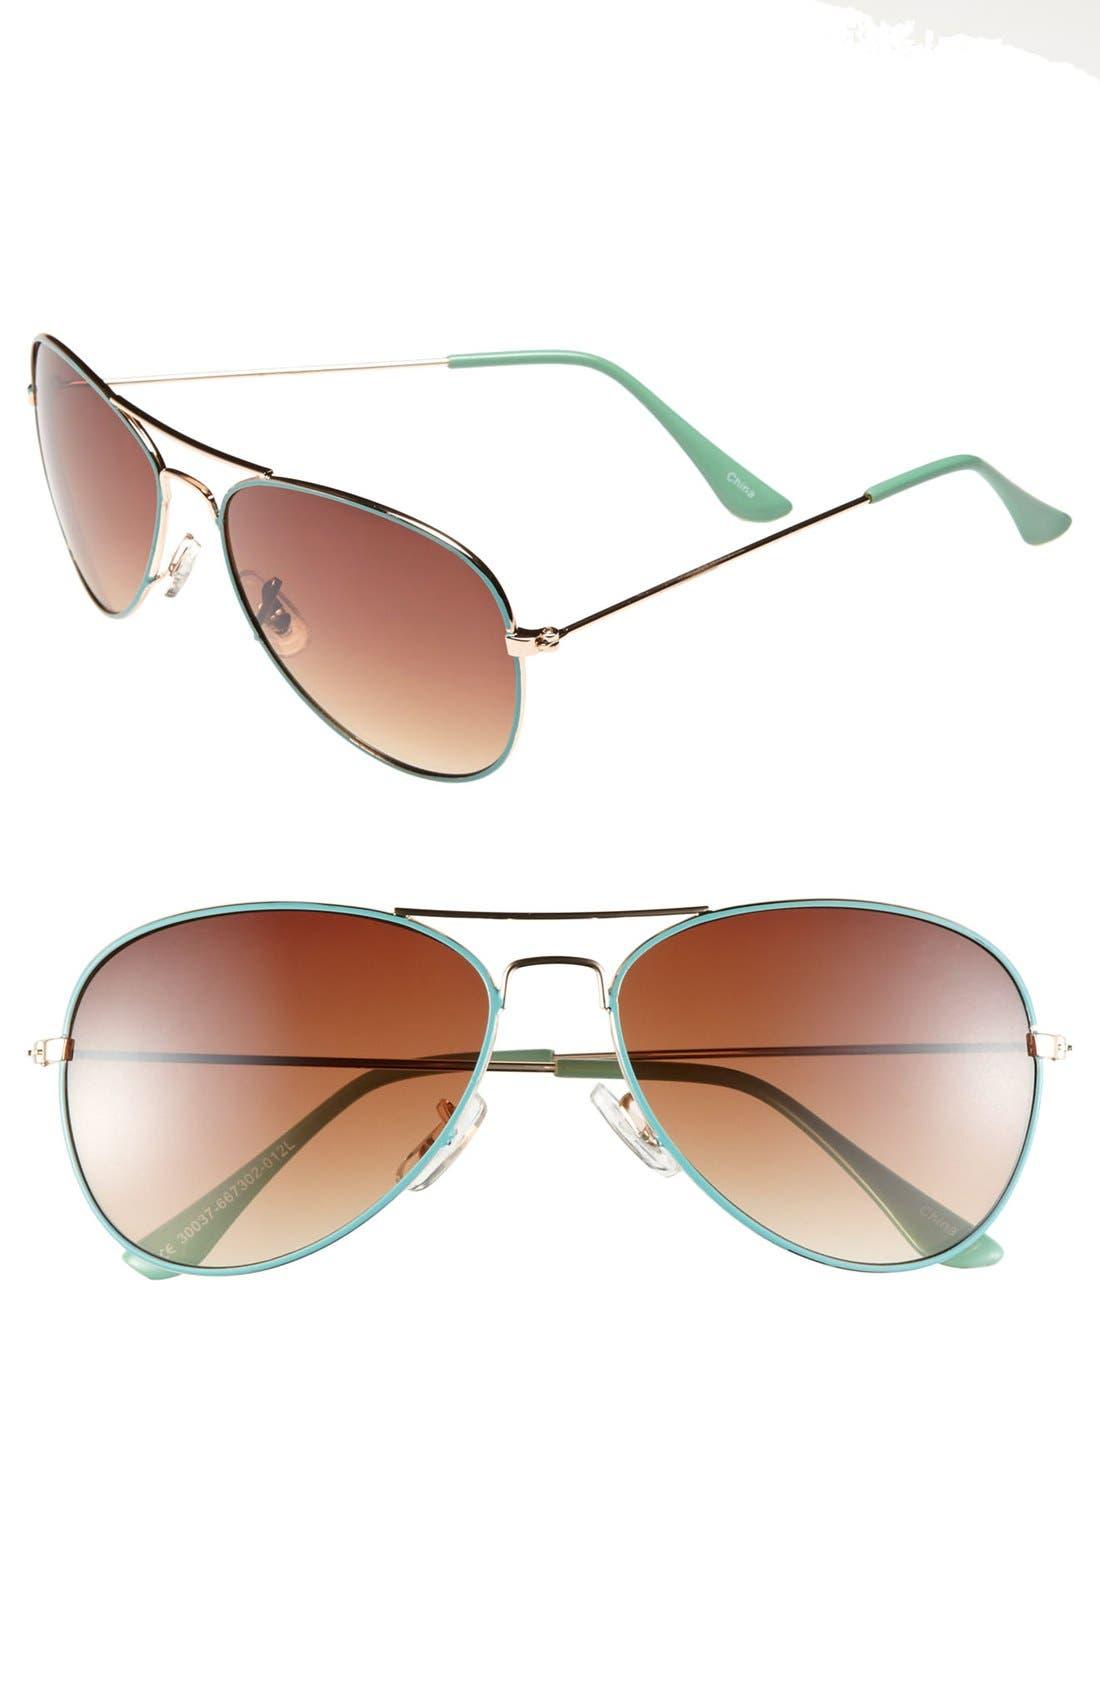 Alternate Image 1 Selected - Icon Eyewear 'Helen' 56mm Aviator Sunglasses (Juniors) (2 for $20)